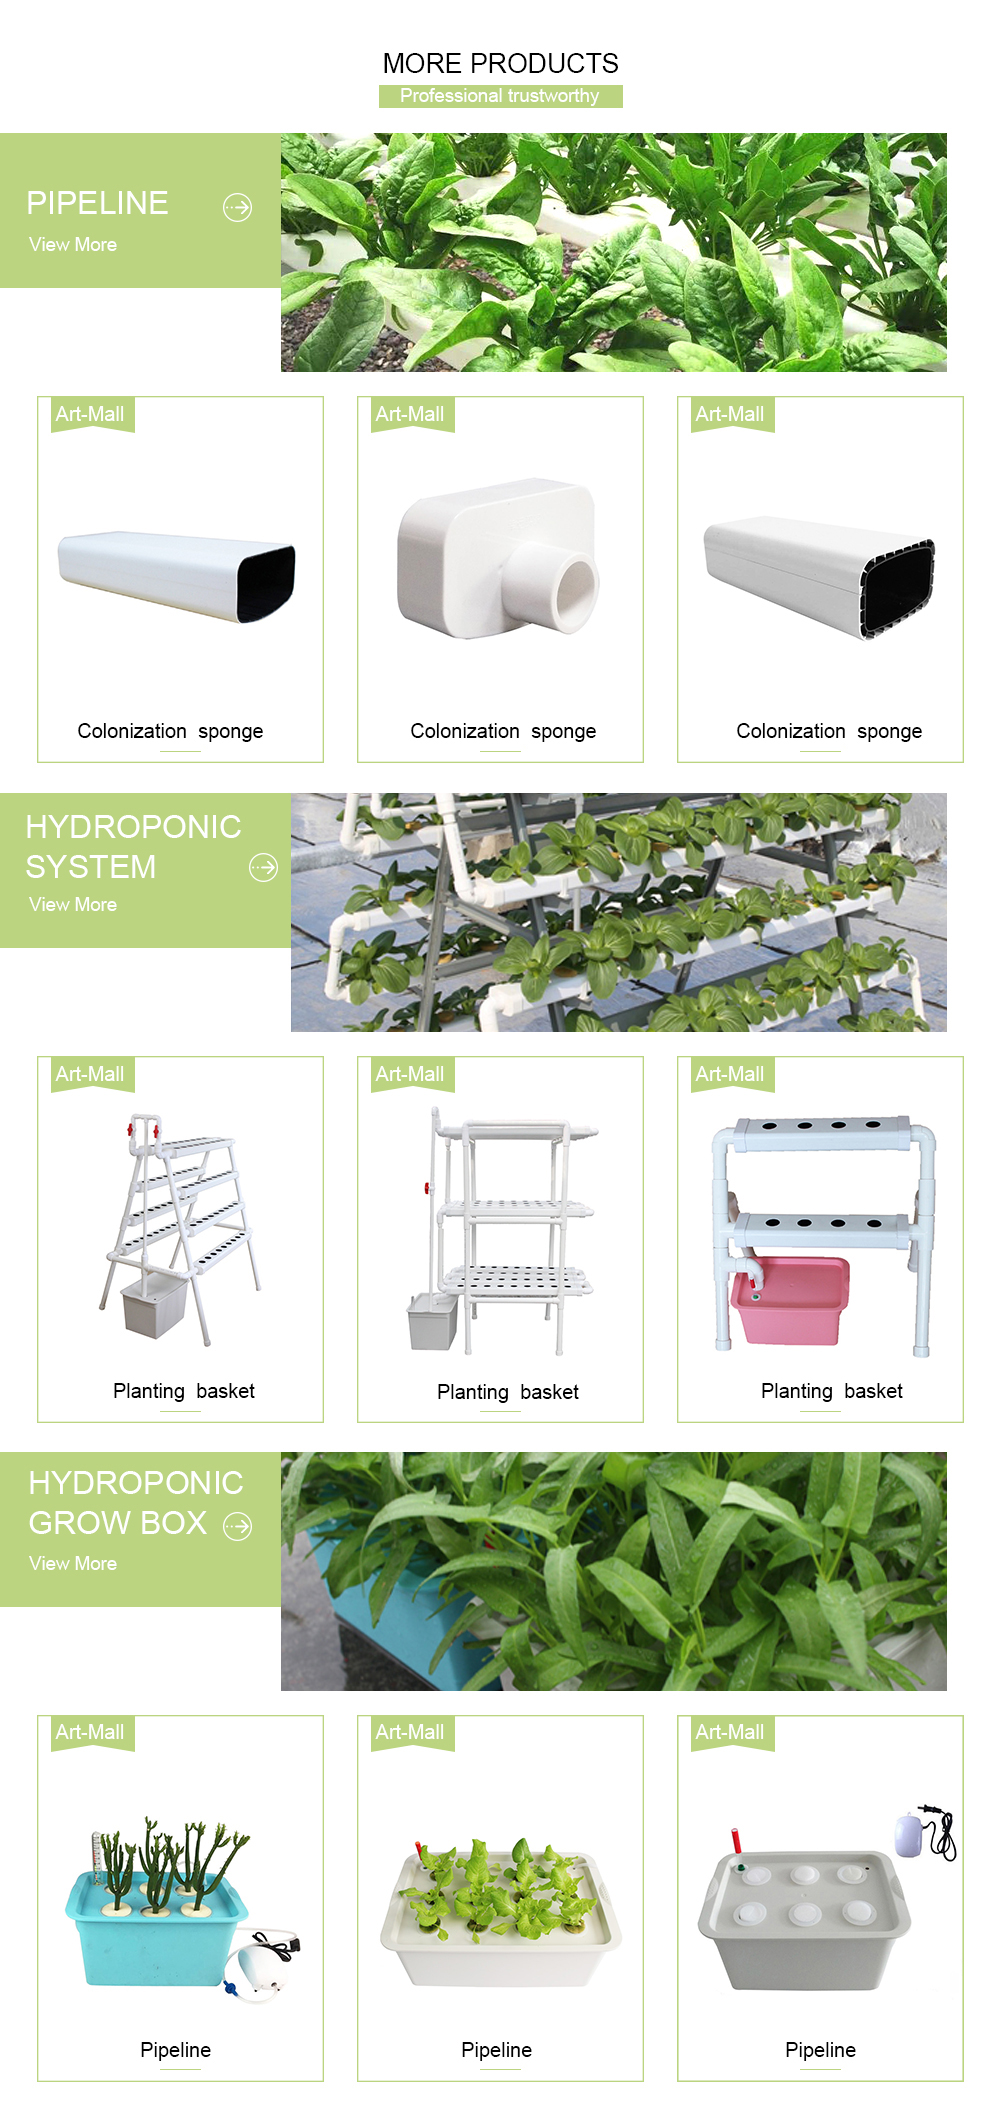 Guaranteed Quality Unique Plant Net Hydroponics Grow Basket